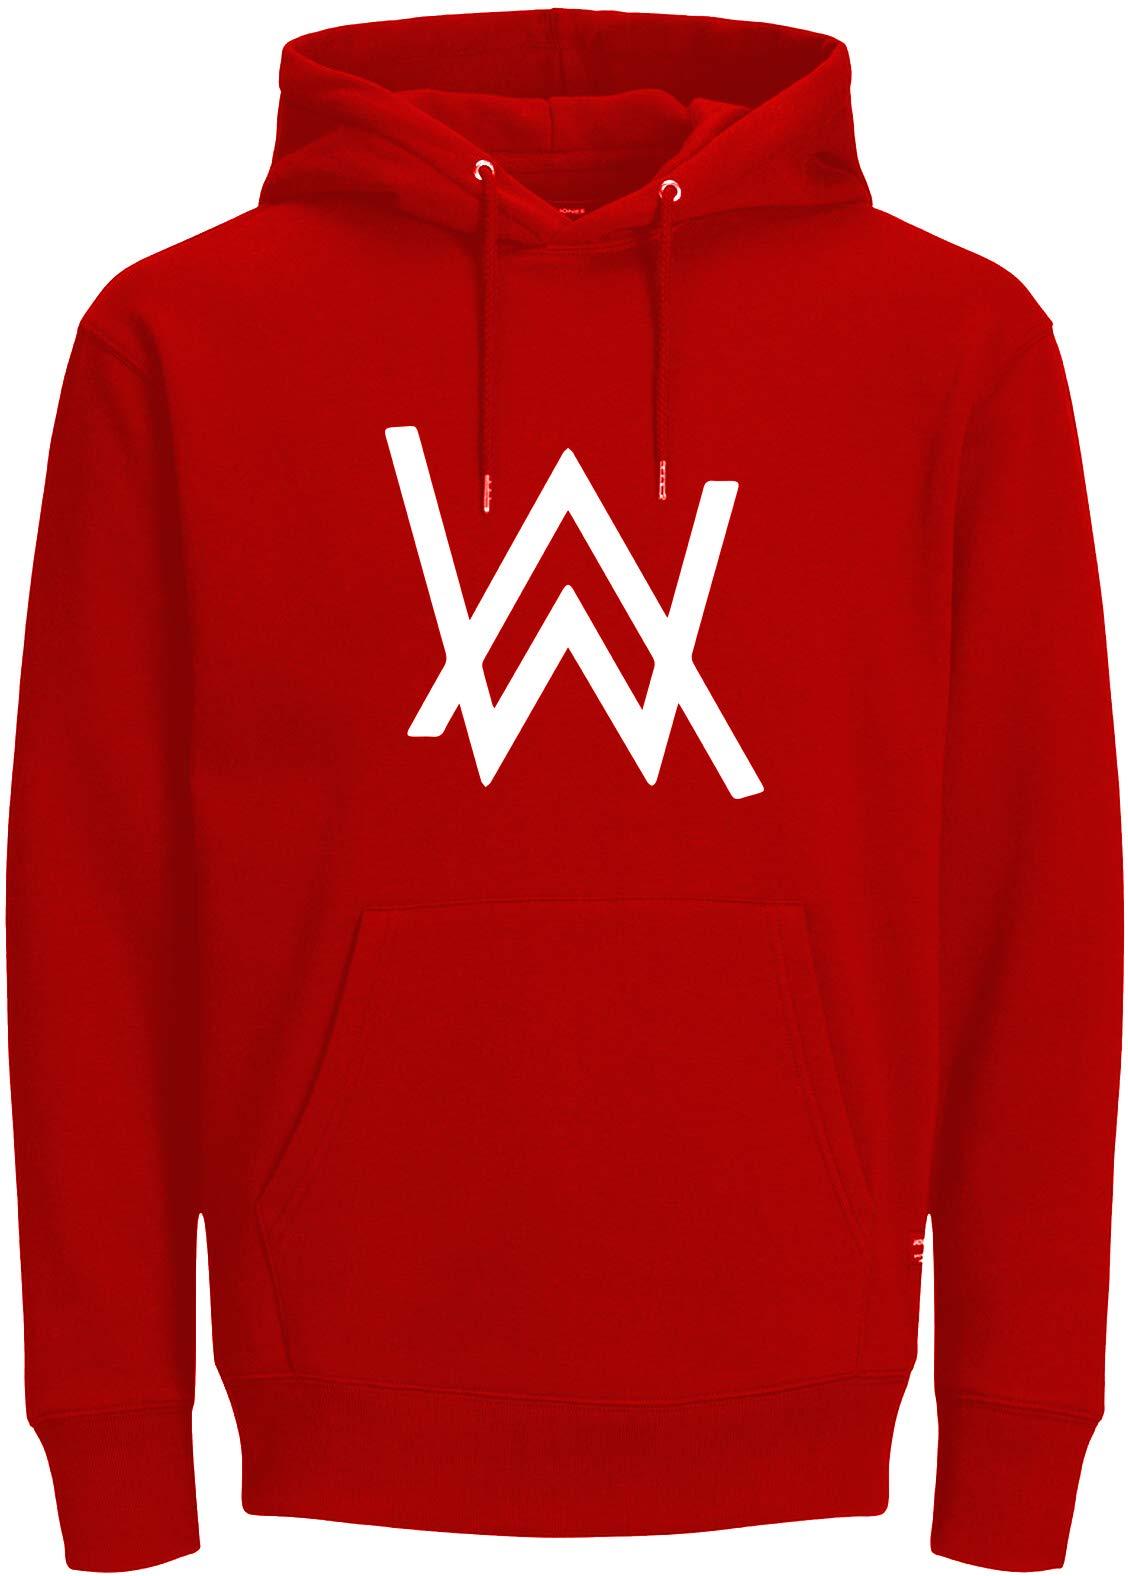 ABSOLUTE DEFENSE Alan Walker Hoodie for Men Women Casual Sweatshirt Regular fit Winter Jacket Boy Girl Hoodie (Red, Small) (B07YZJRDBH) Amazon Price History, Amazon Price Tracker